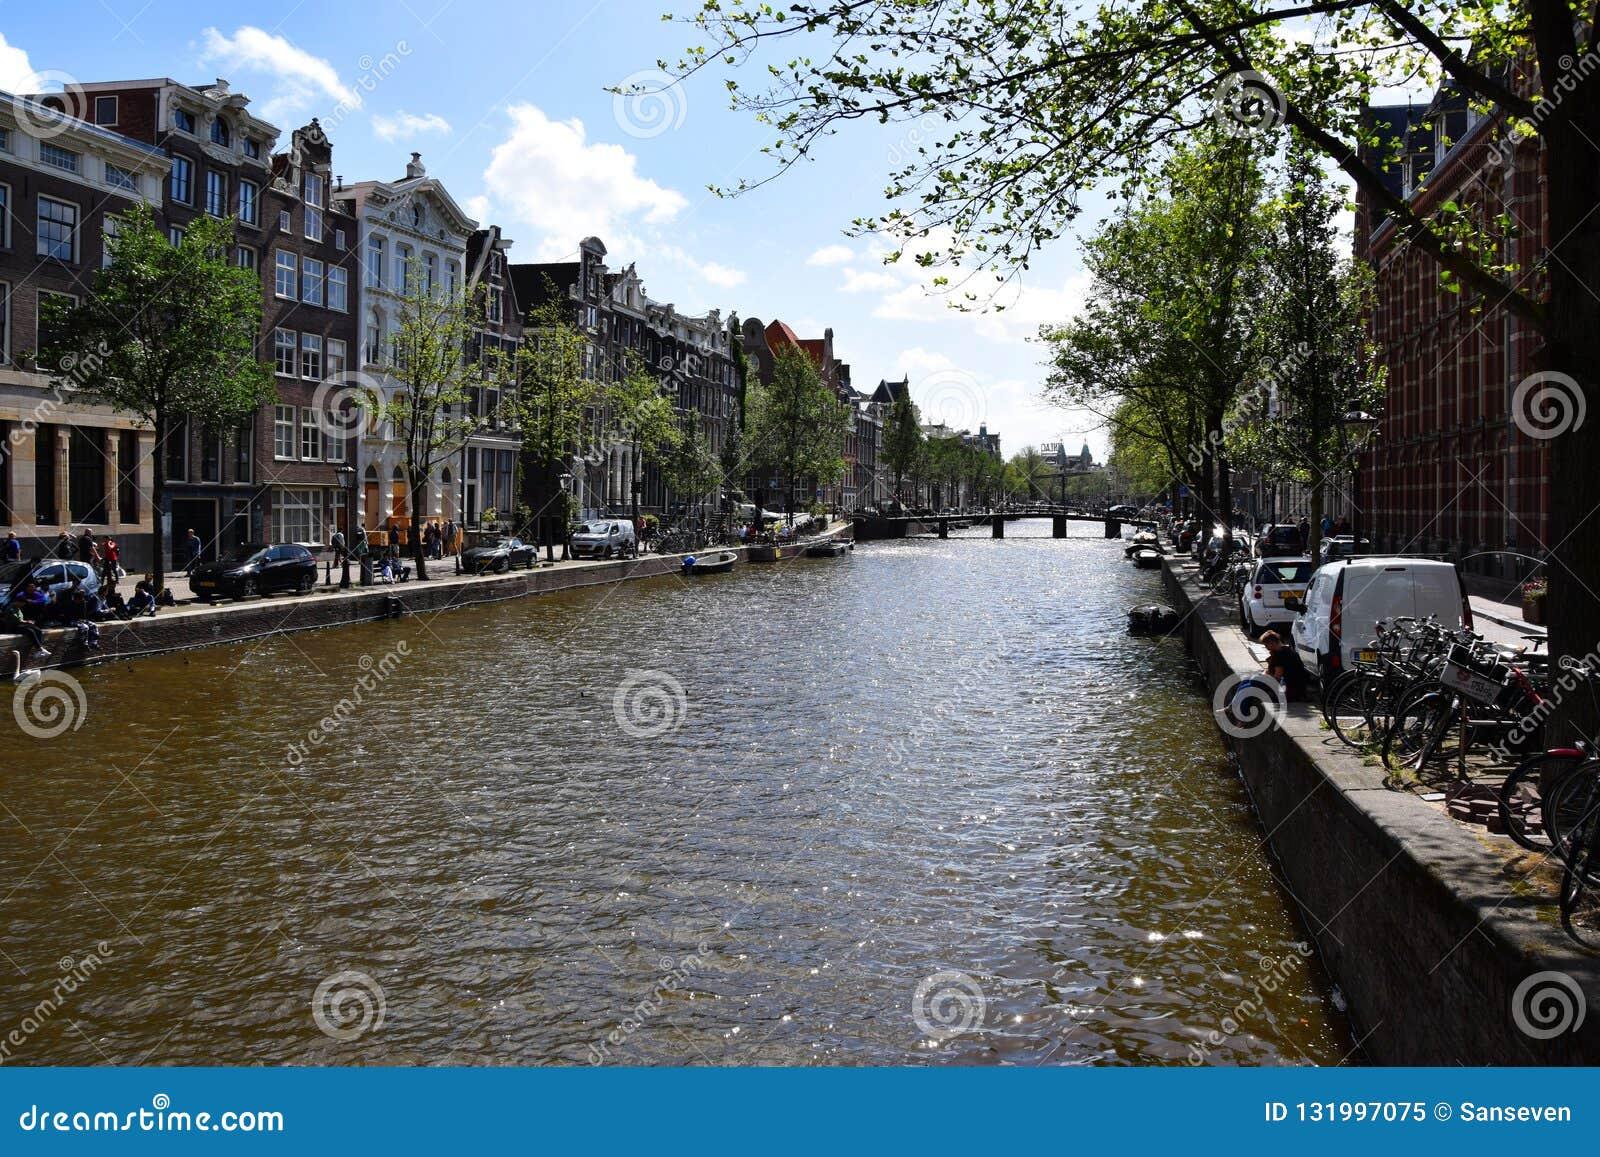 Wijde heisteeg bridge, Herengracht Canal, Amsterdam, Holland, Netherlands